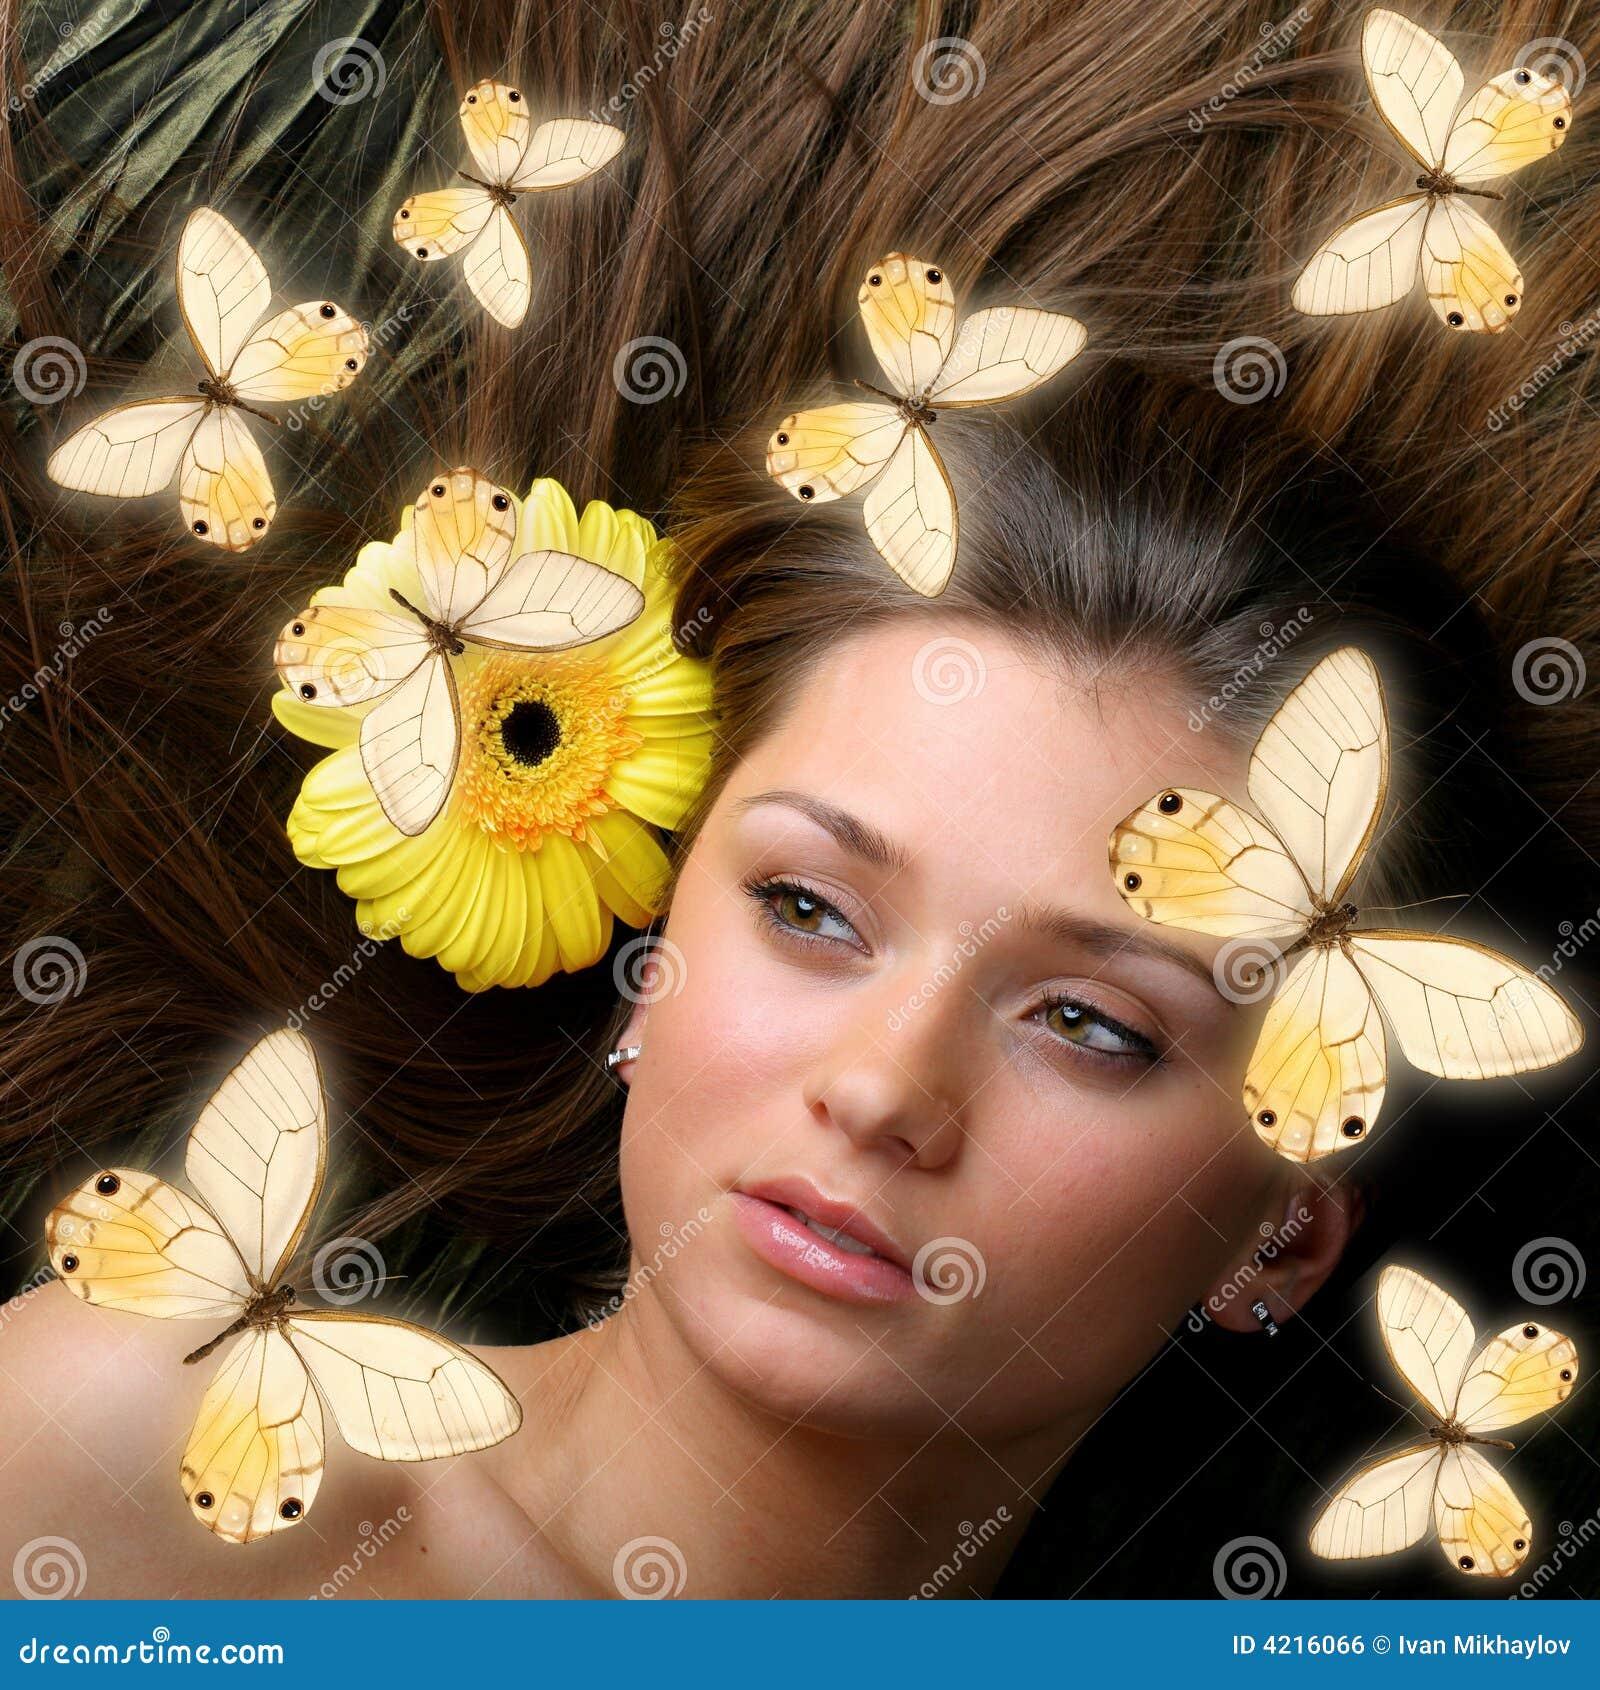 <b>Butterfly girl</b> - butterfly-girl-4216066